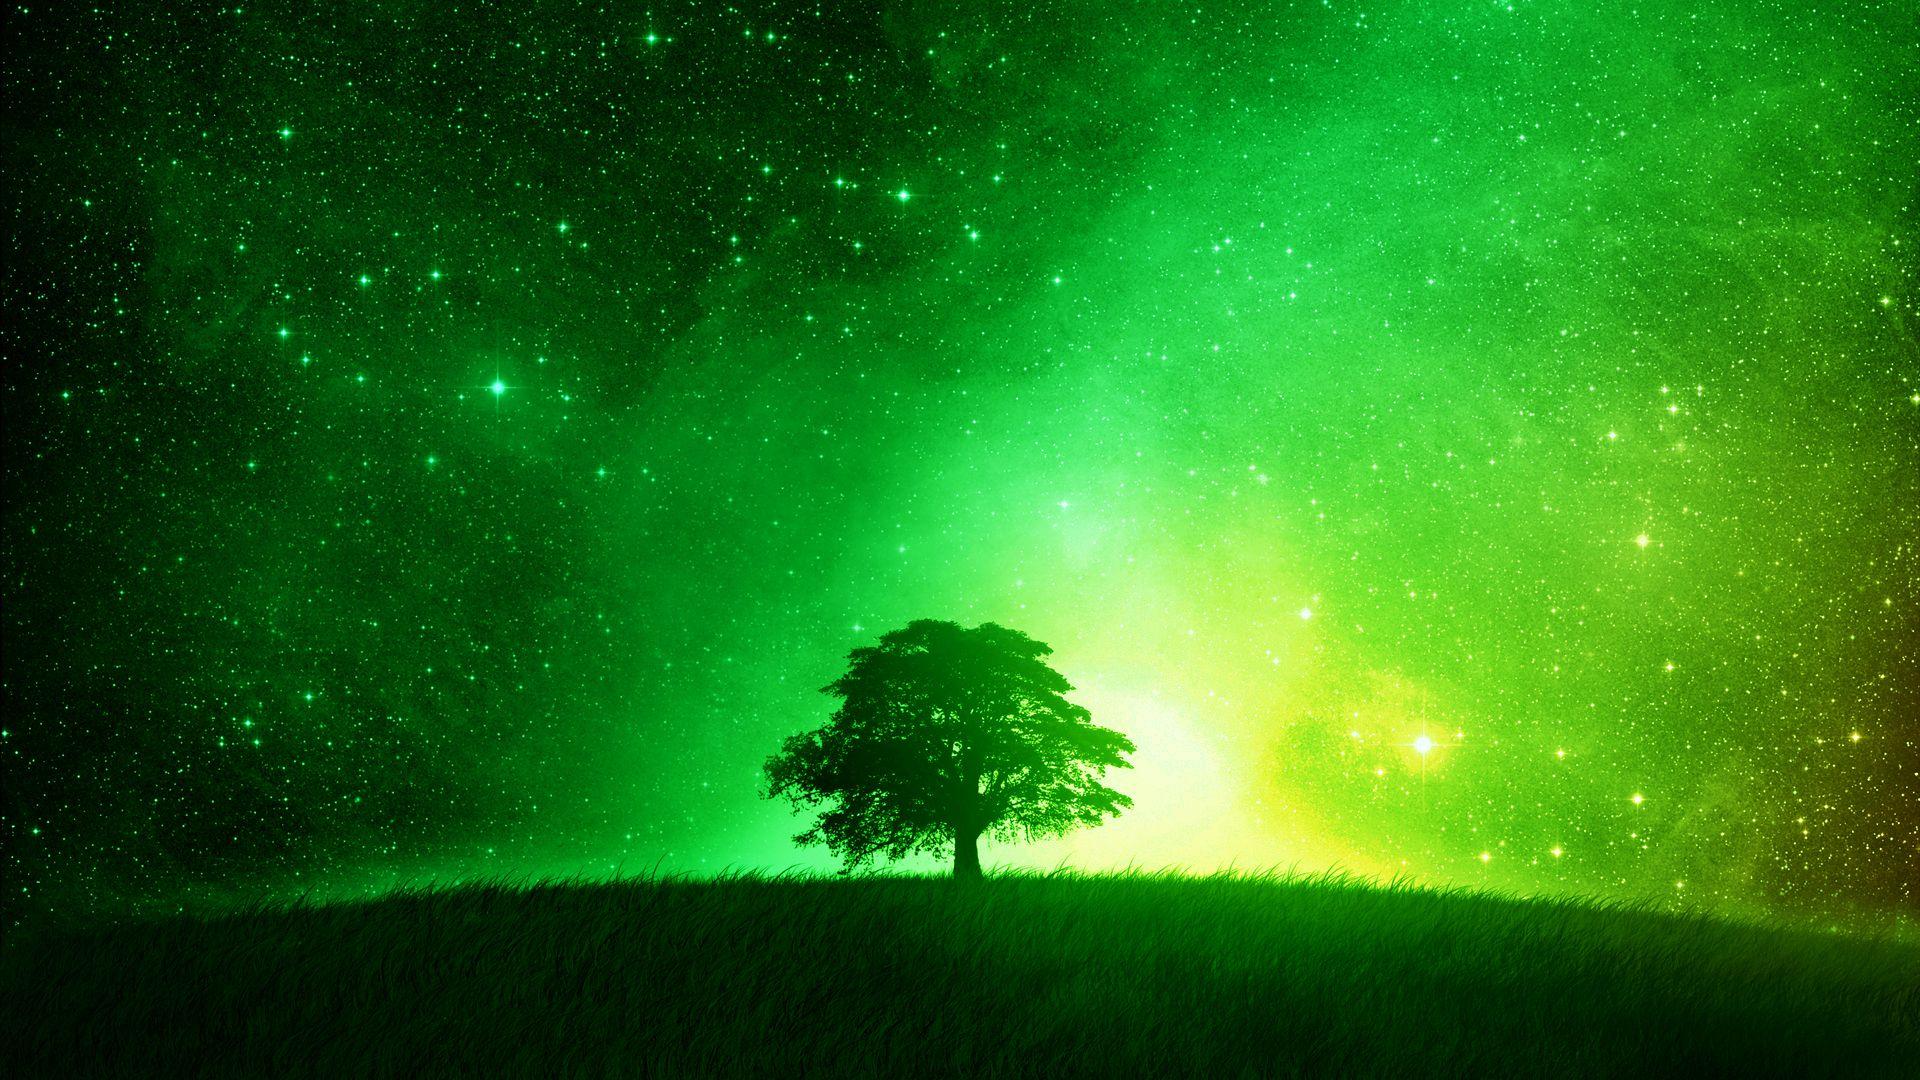 Green Wallpaper 1920x1080 (2470,04 Kilobyte 1920x1080 px